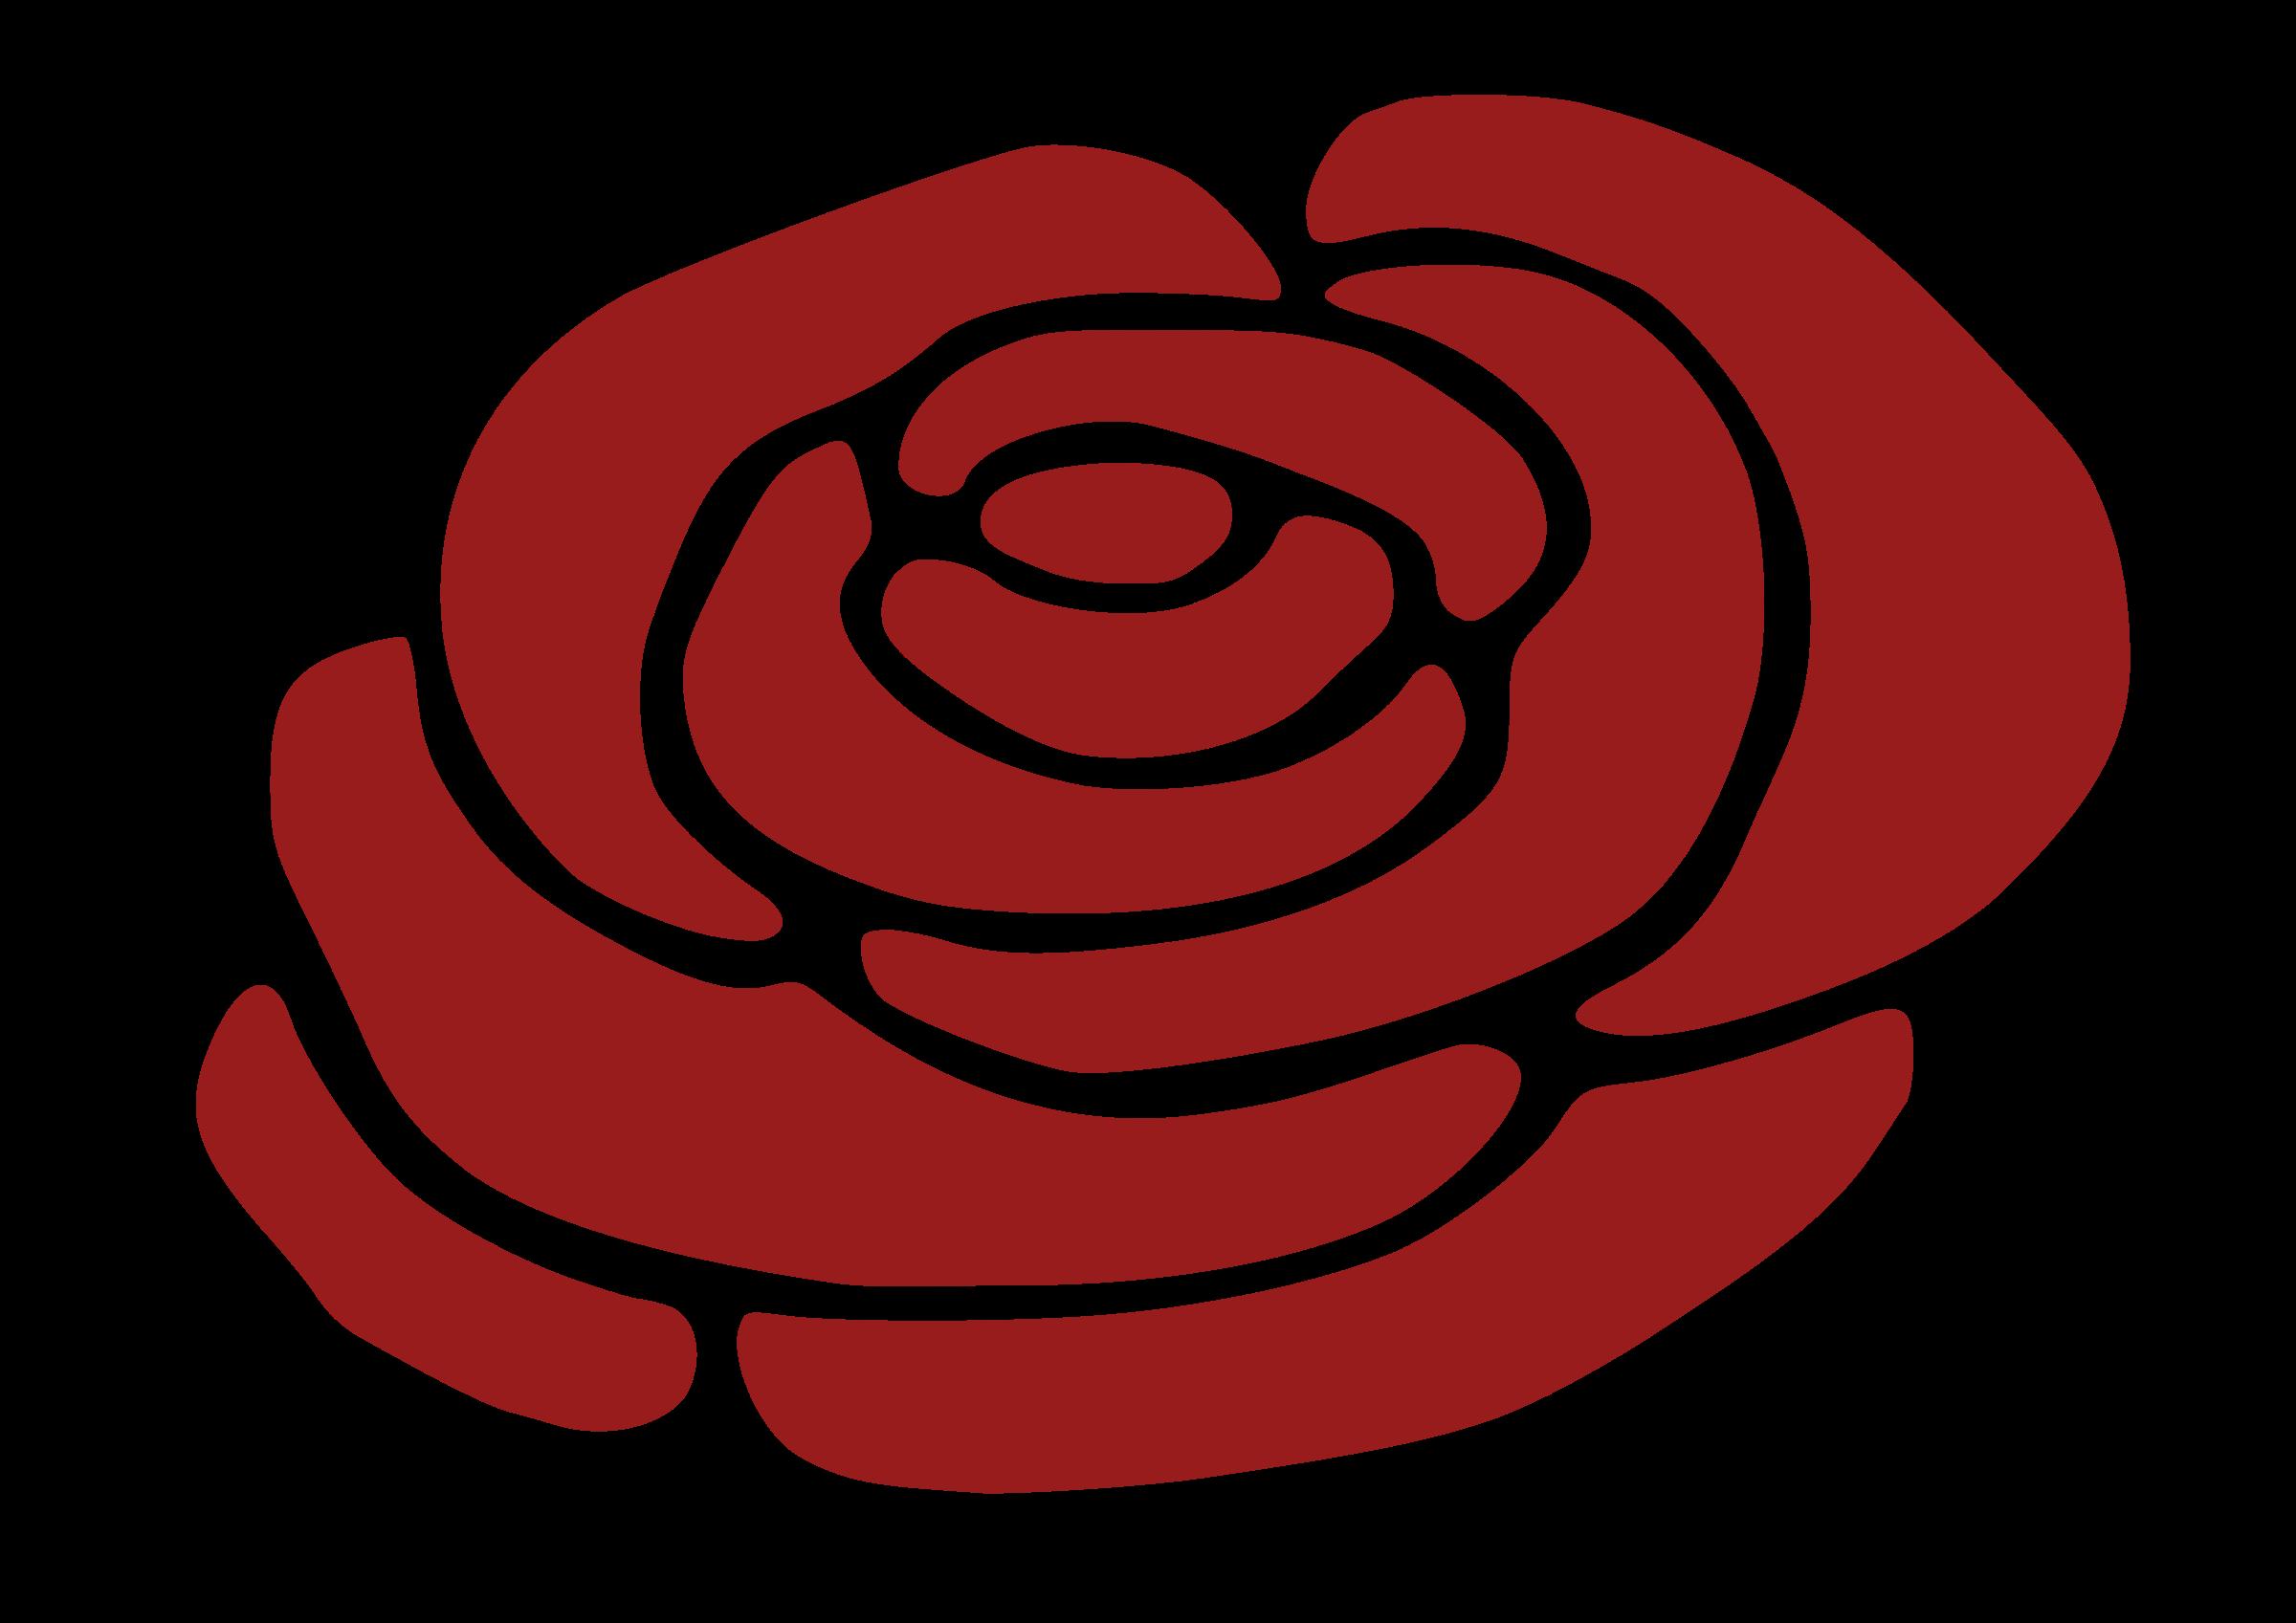 Ireland vector big image. Clipart rose silhouette